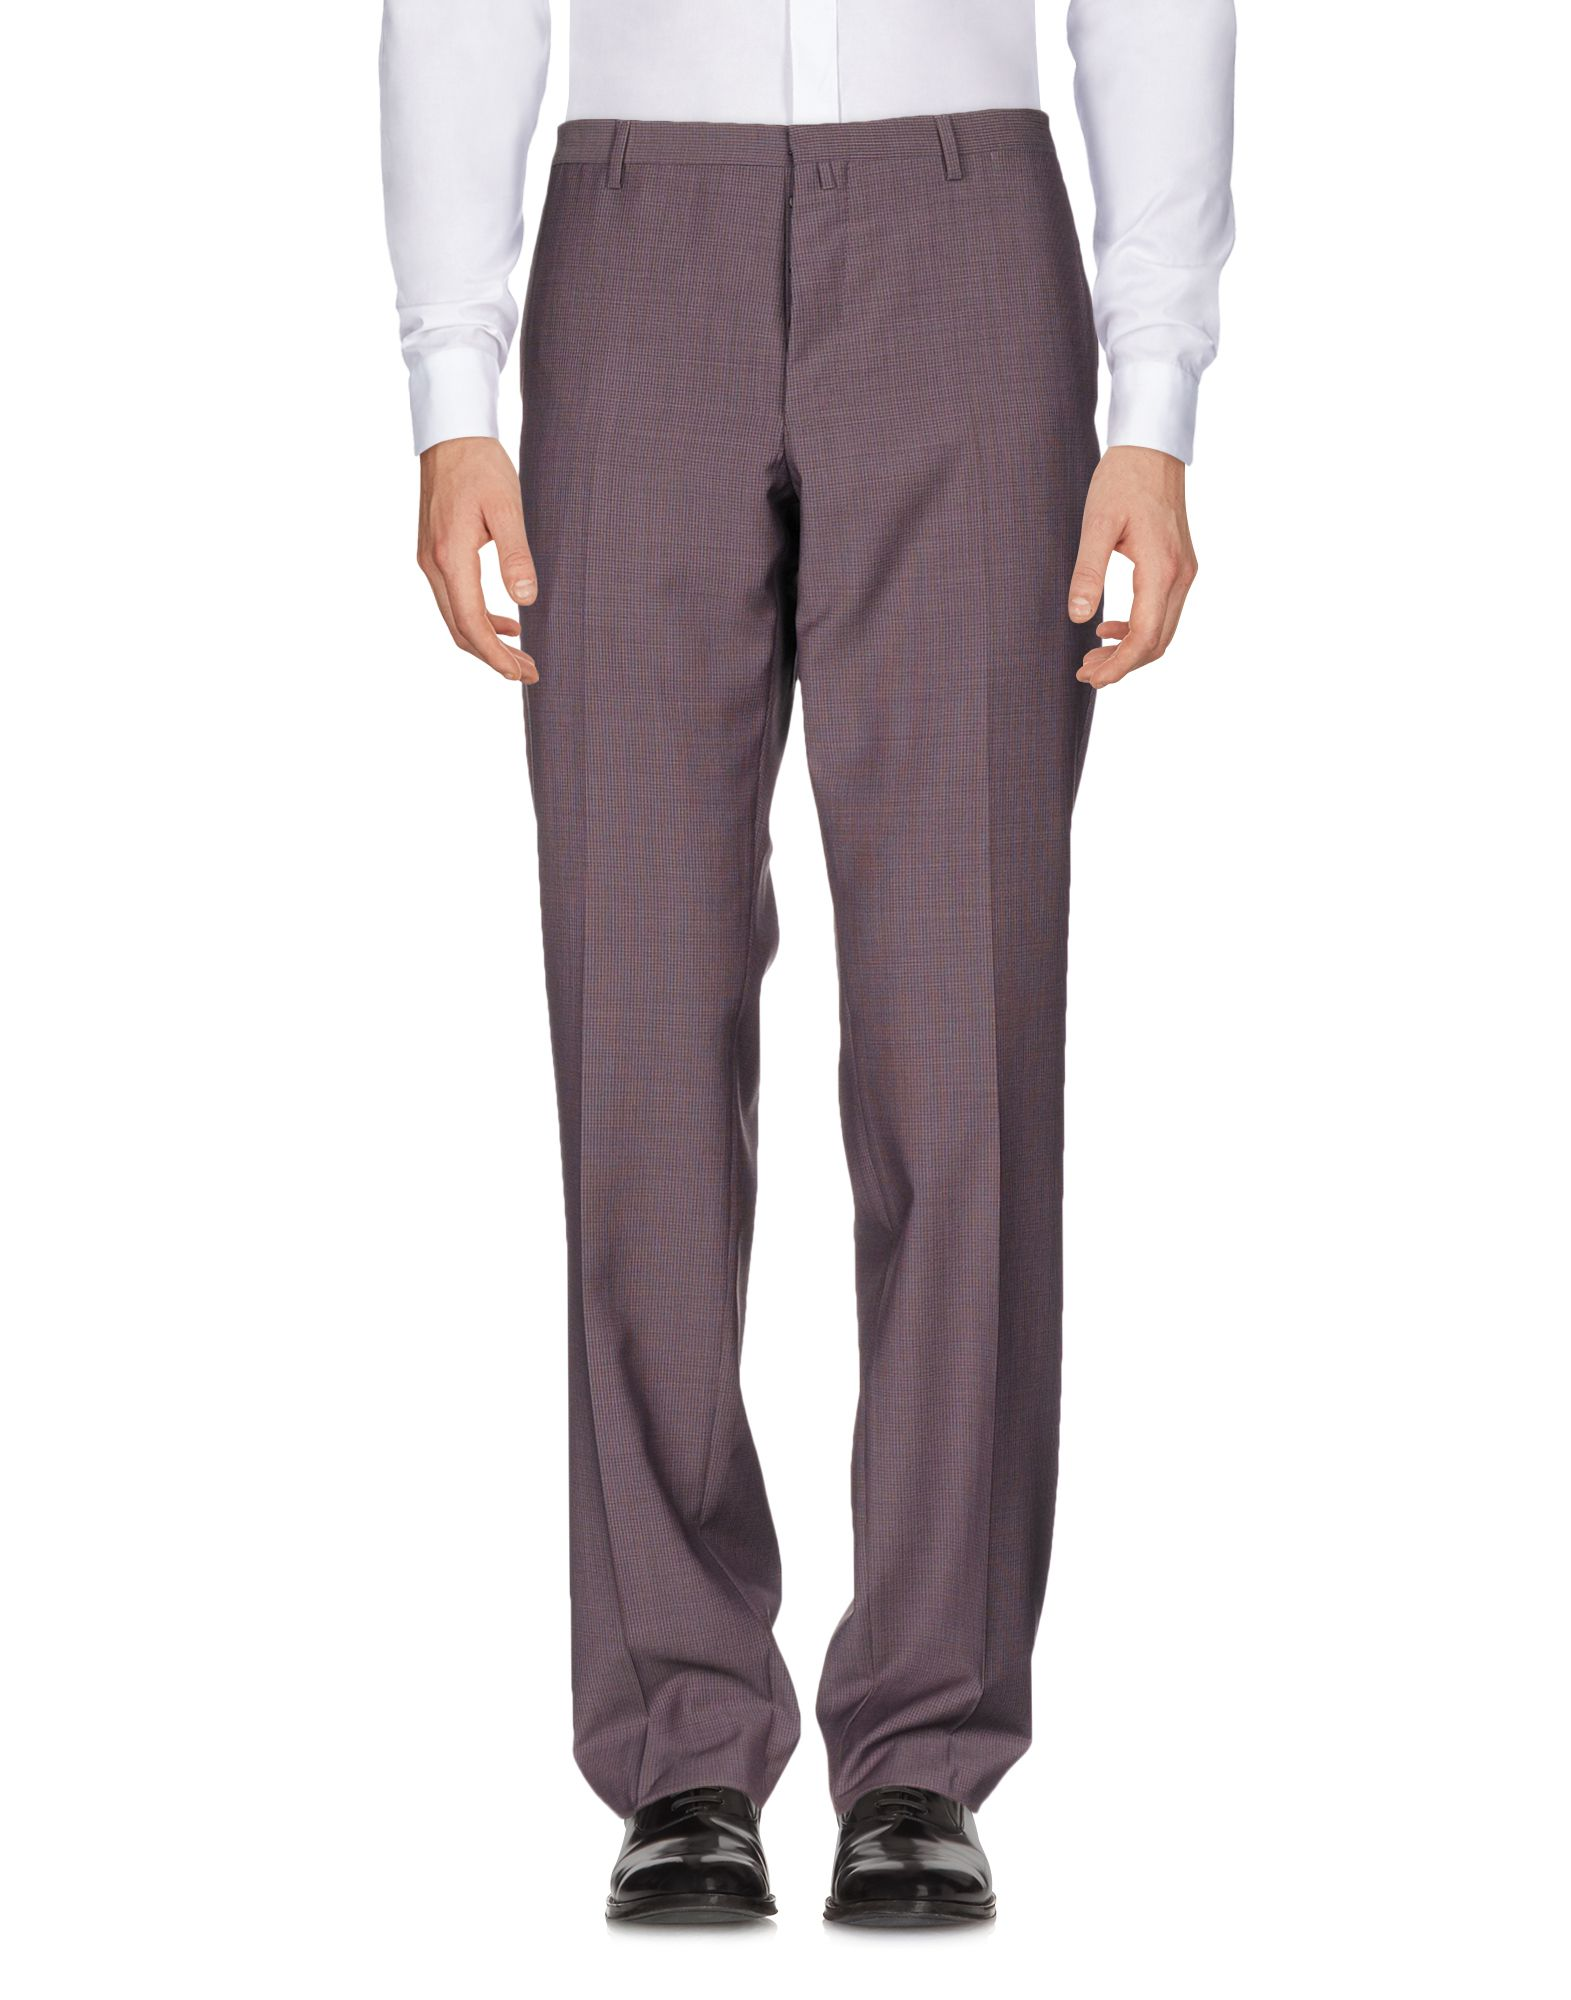 Pantalone Jil Sander Uomo - Acquista online su